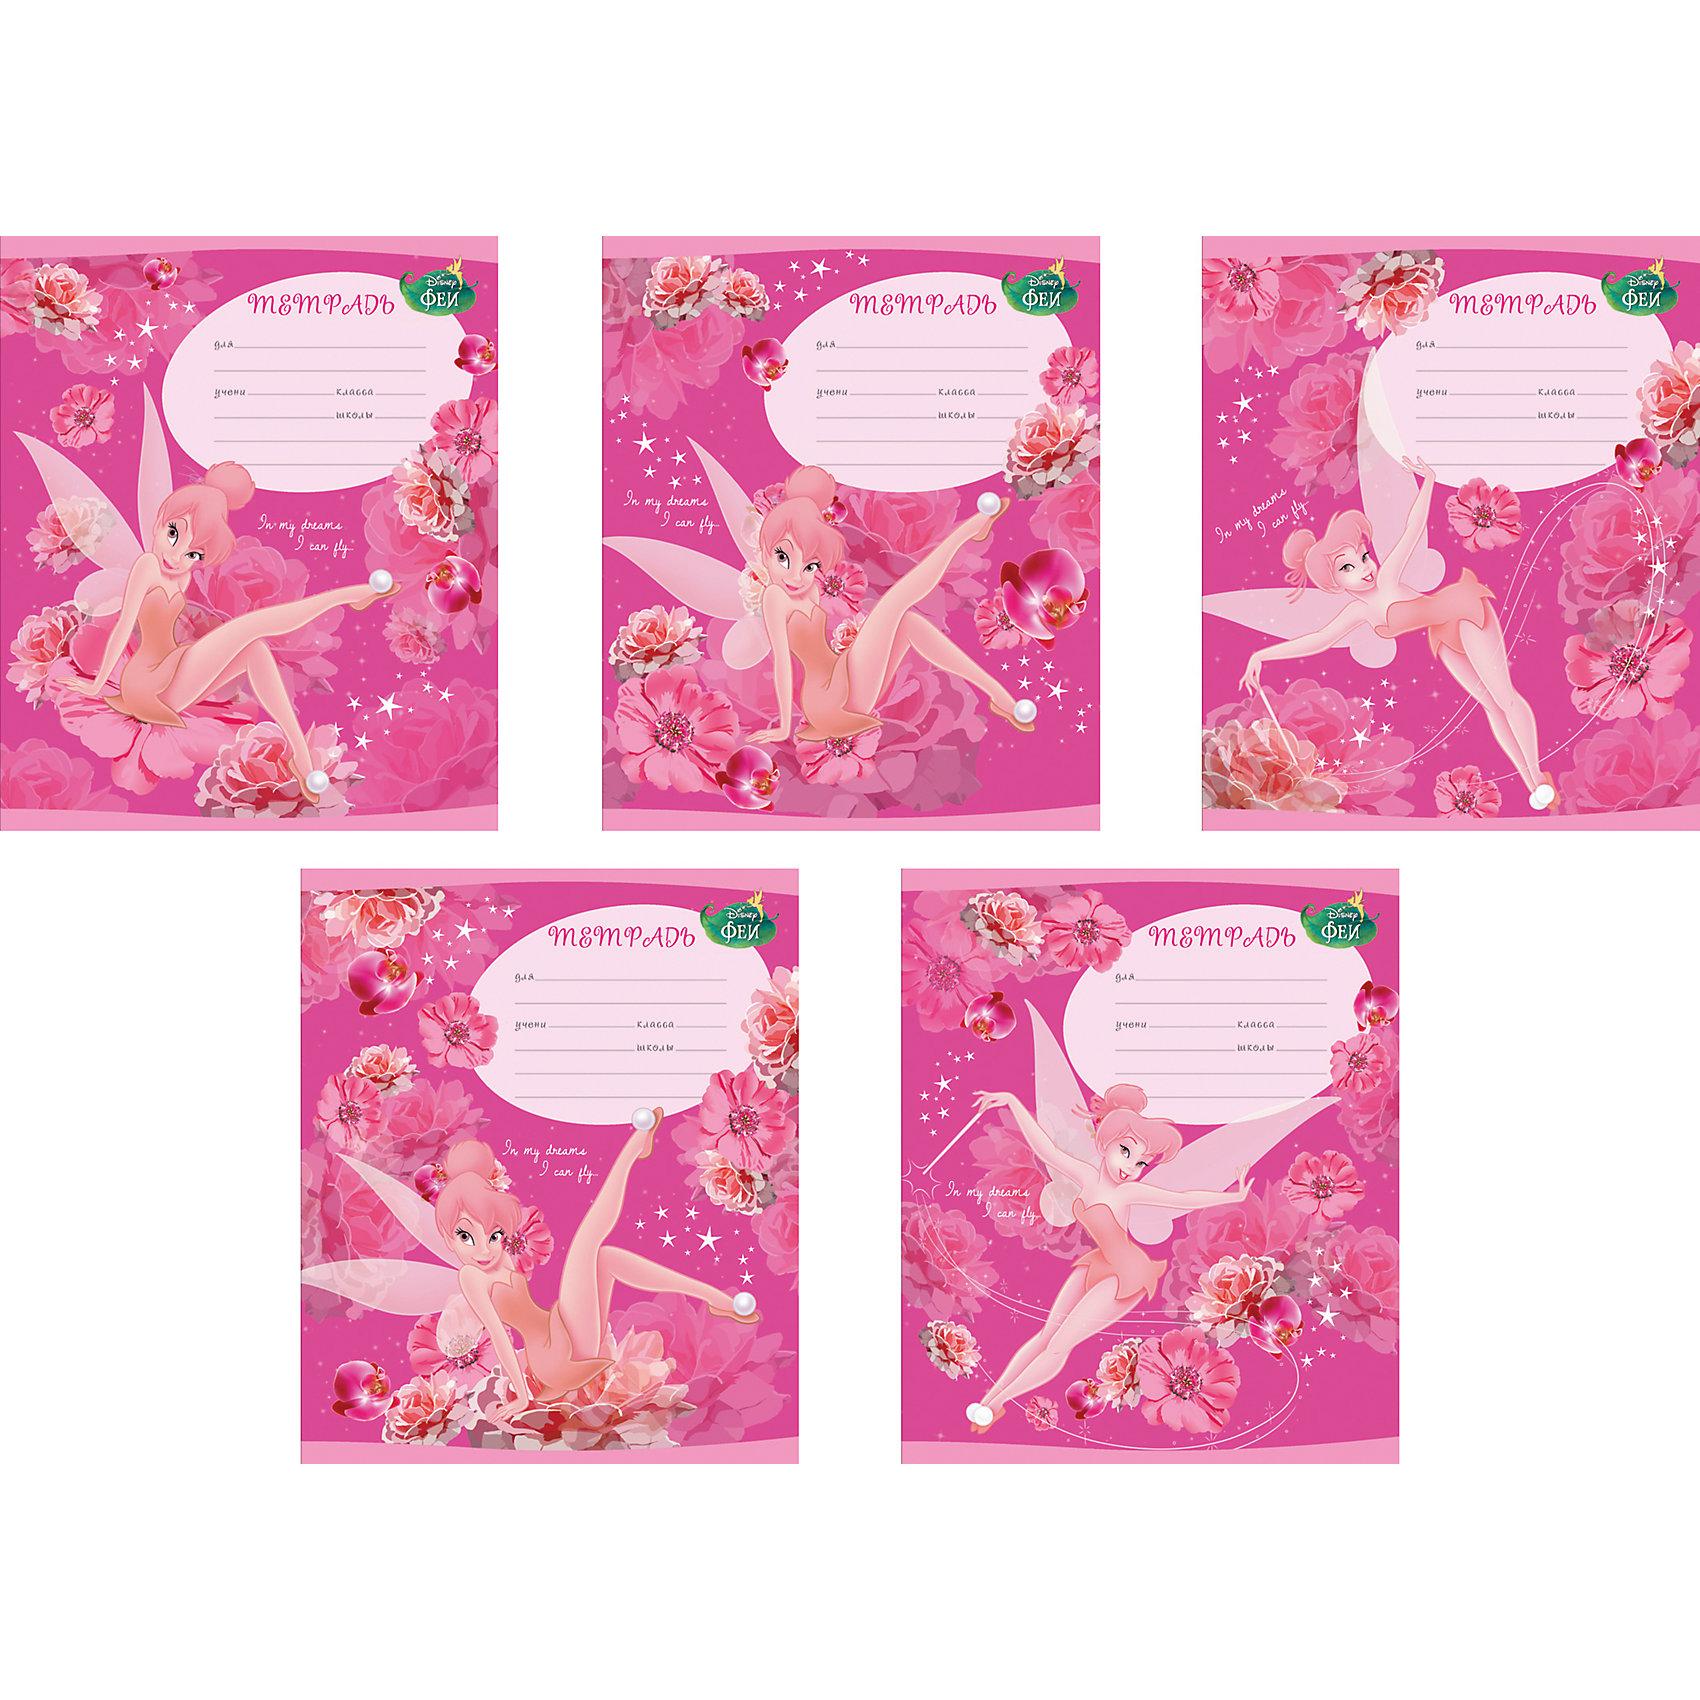 ErichKrause Школьная тетрадь Tink Pink, 12 л., 10 шт. рюкзак детский erichkrause erichkrause школьный рюкзак city explorer